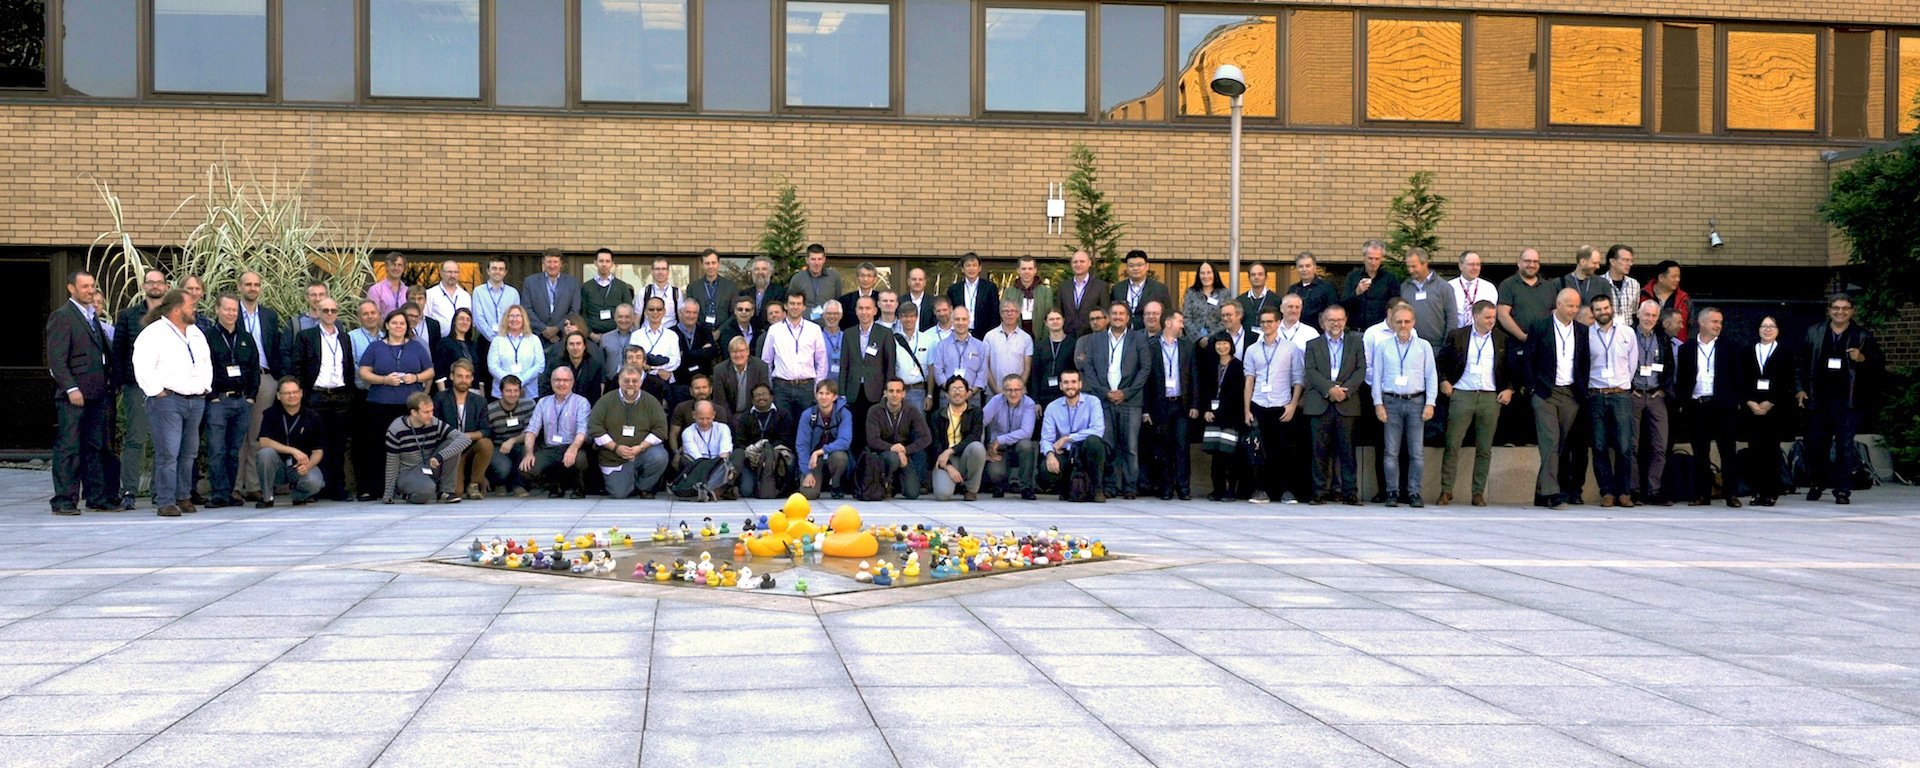 18th Workshop on high performance computing in meteorology | ECMWF